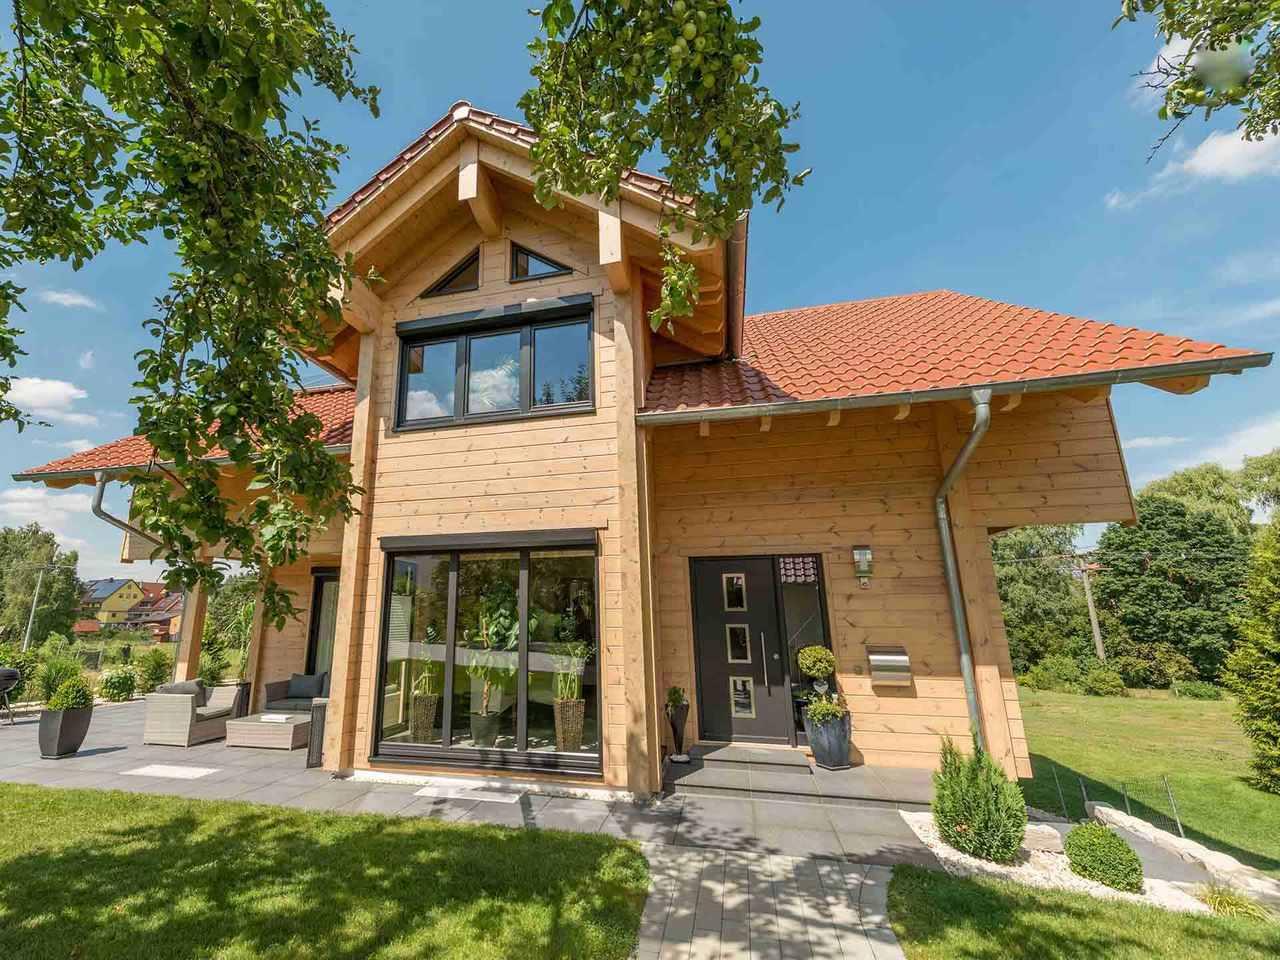 Holzhaus Mittelfranken - Fullwood Wohnblockhaus